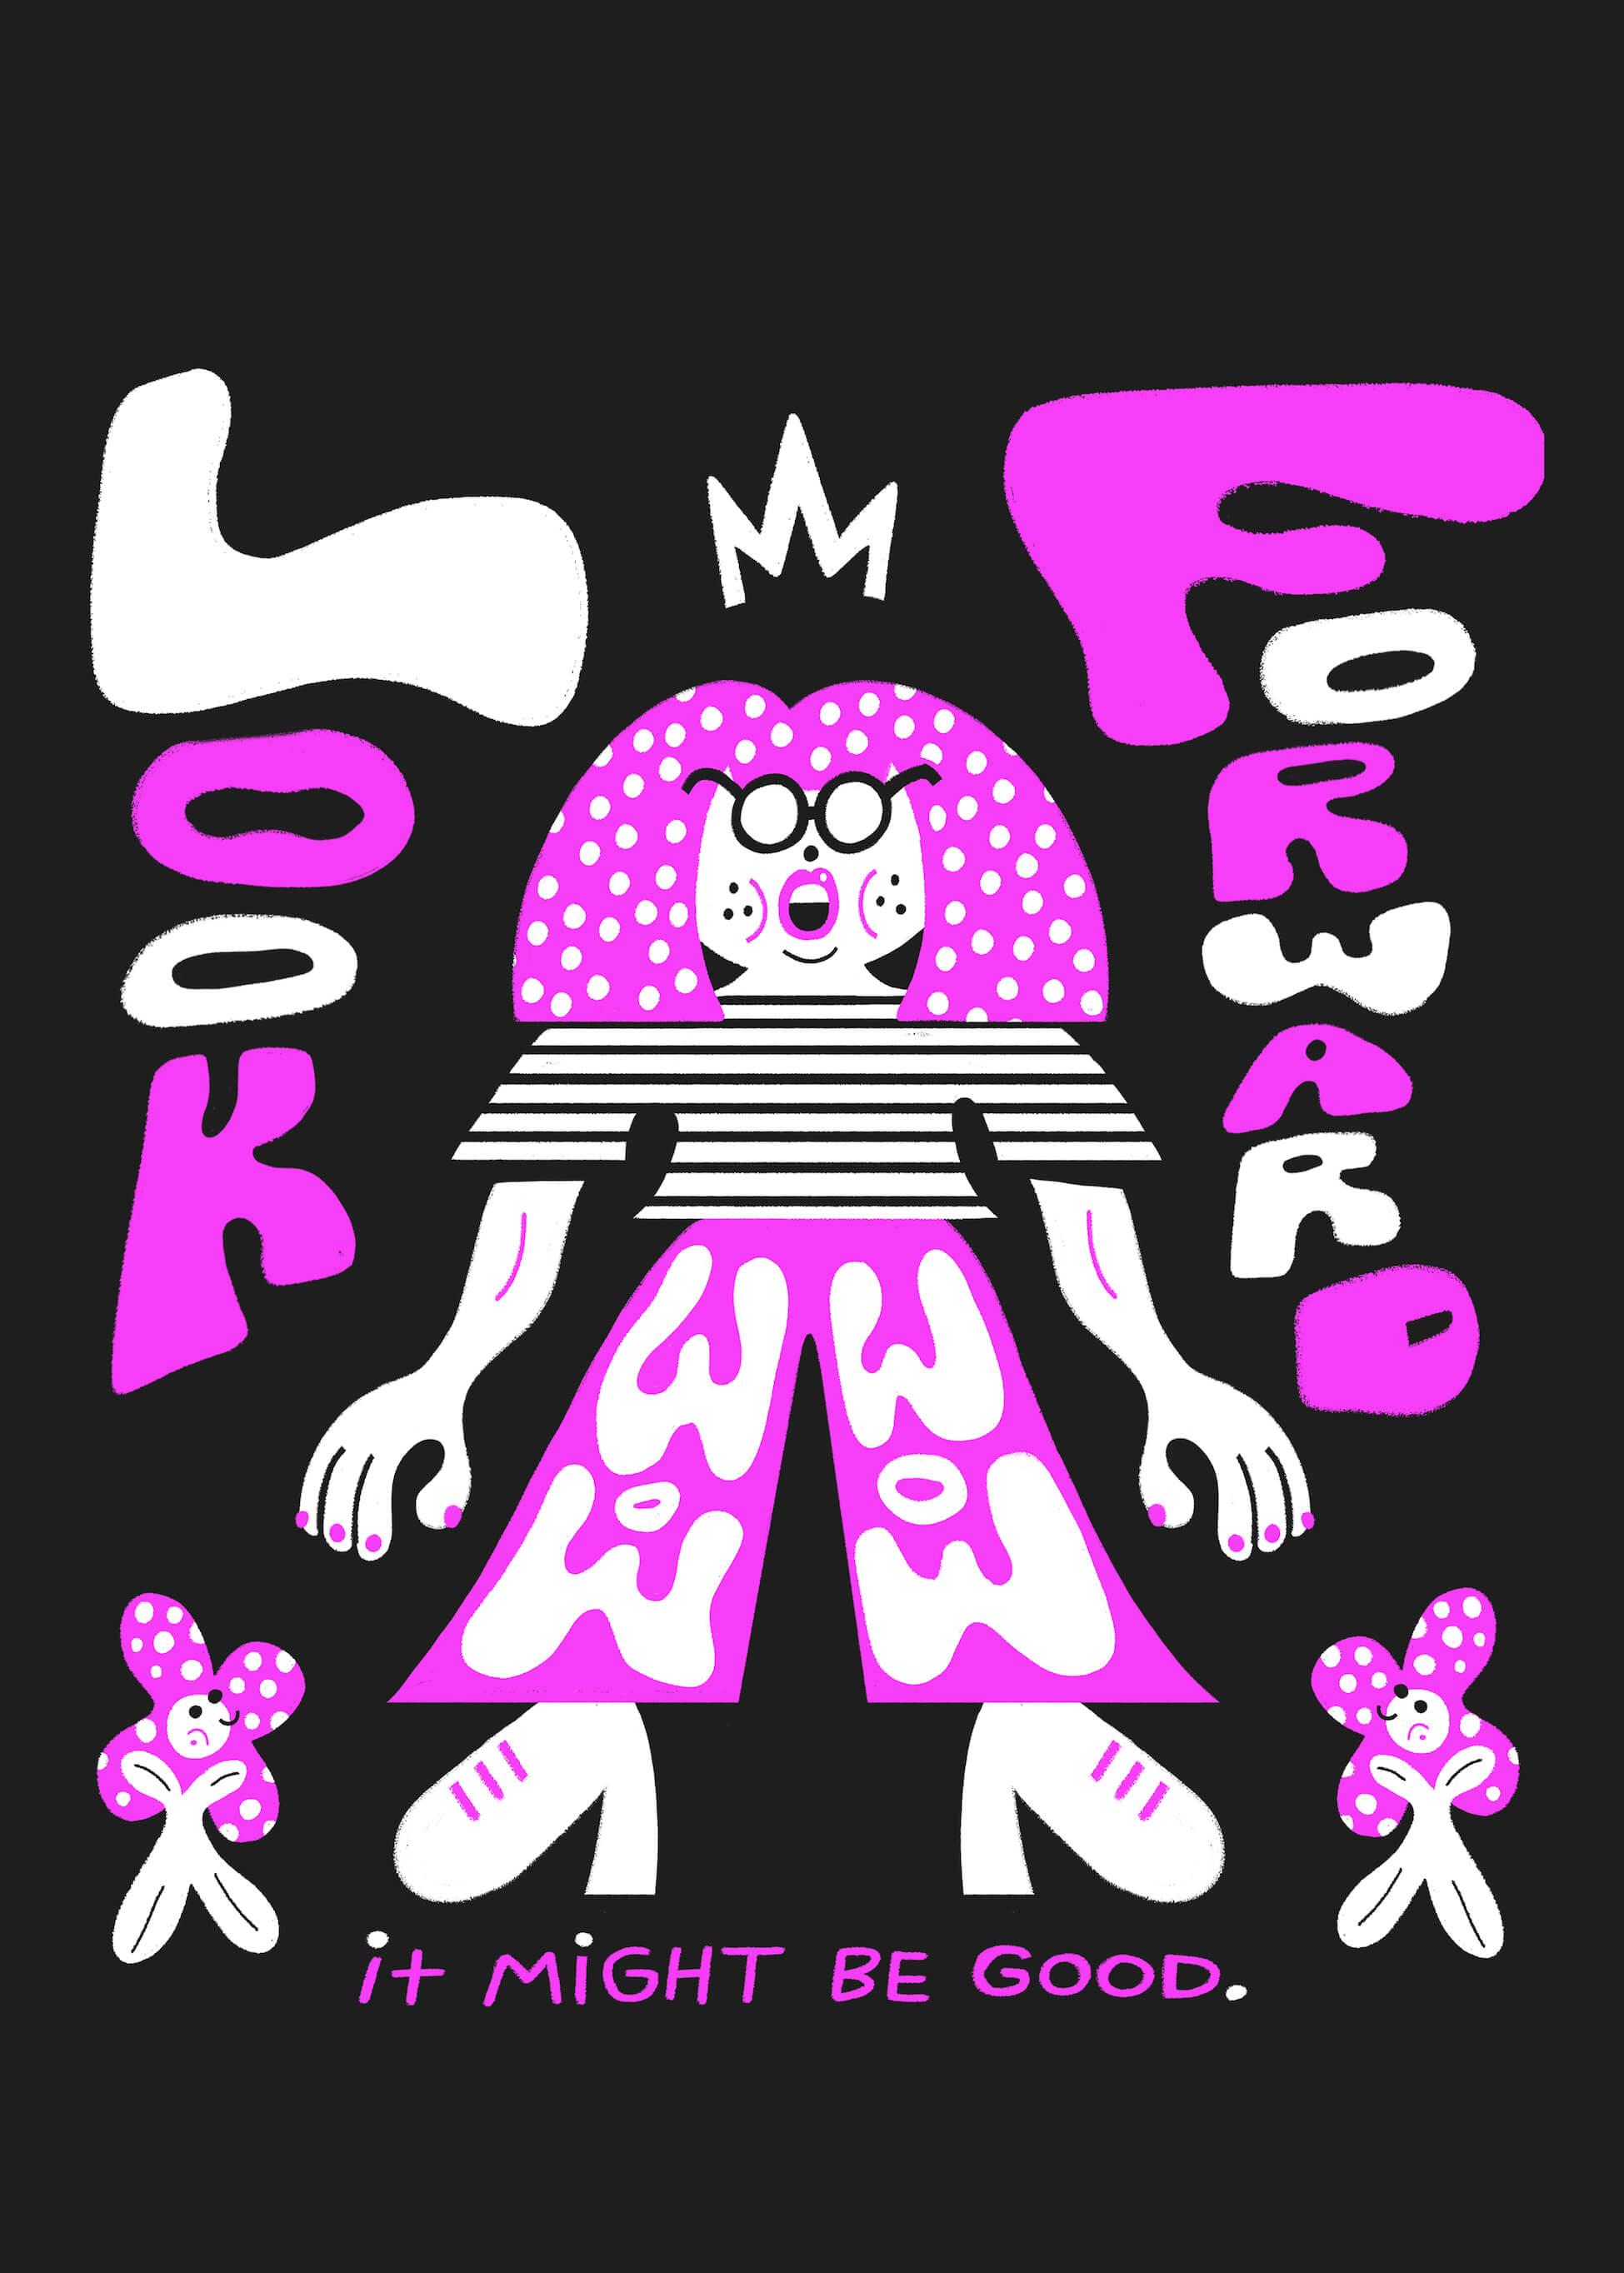 Look Forward main image